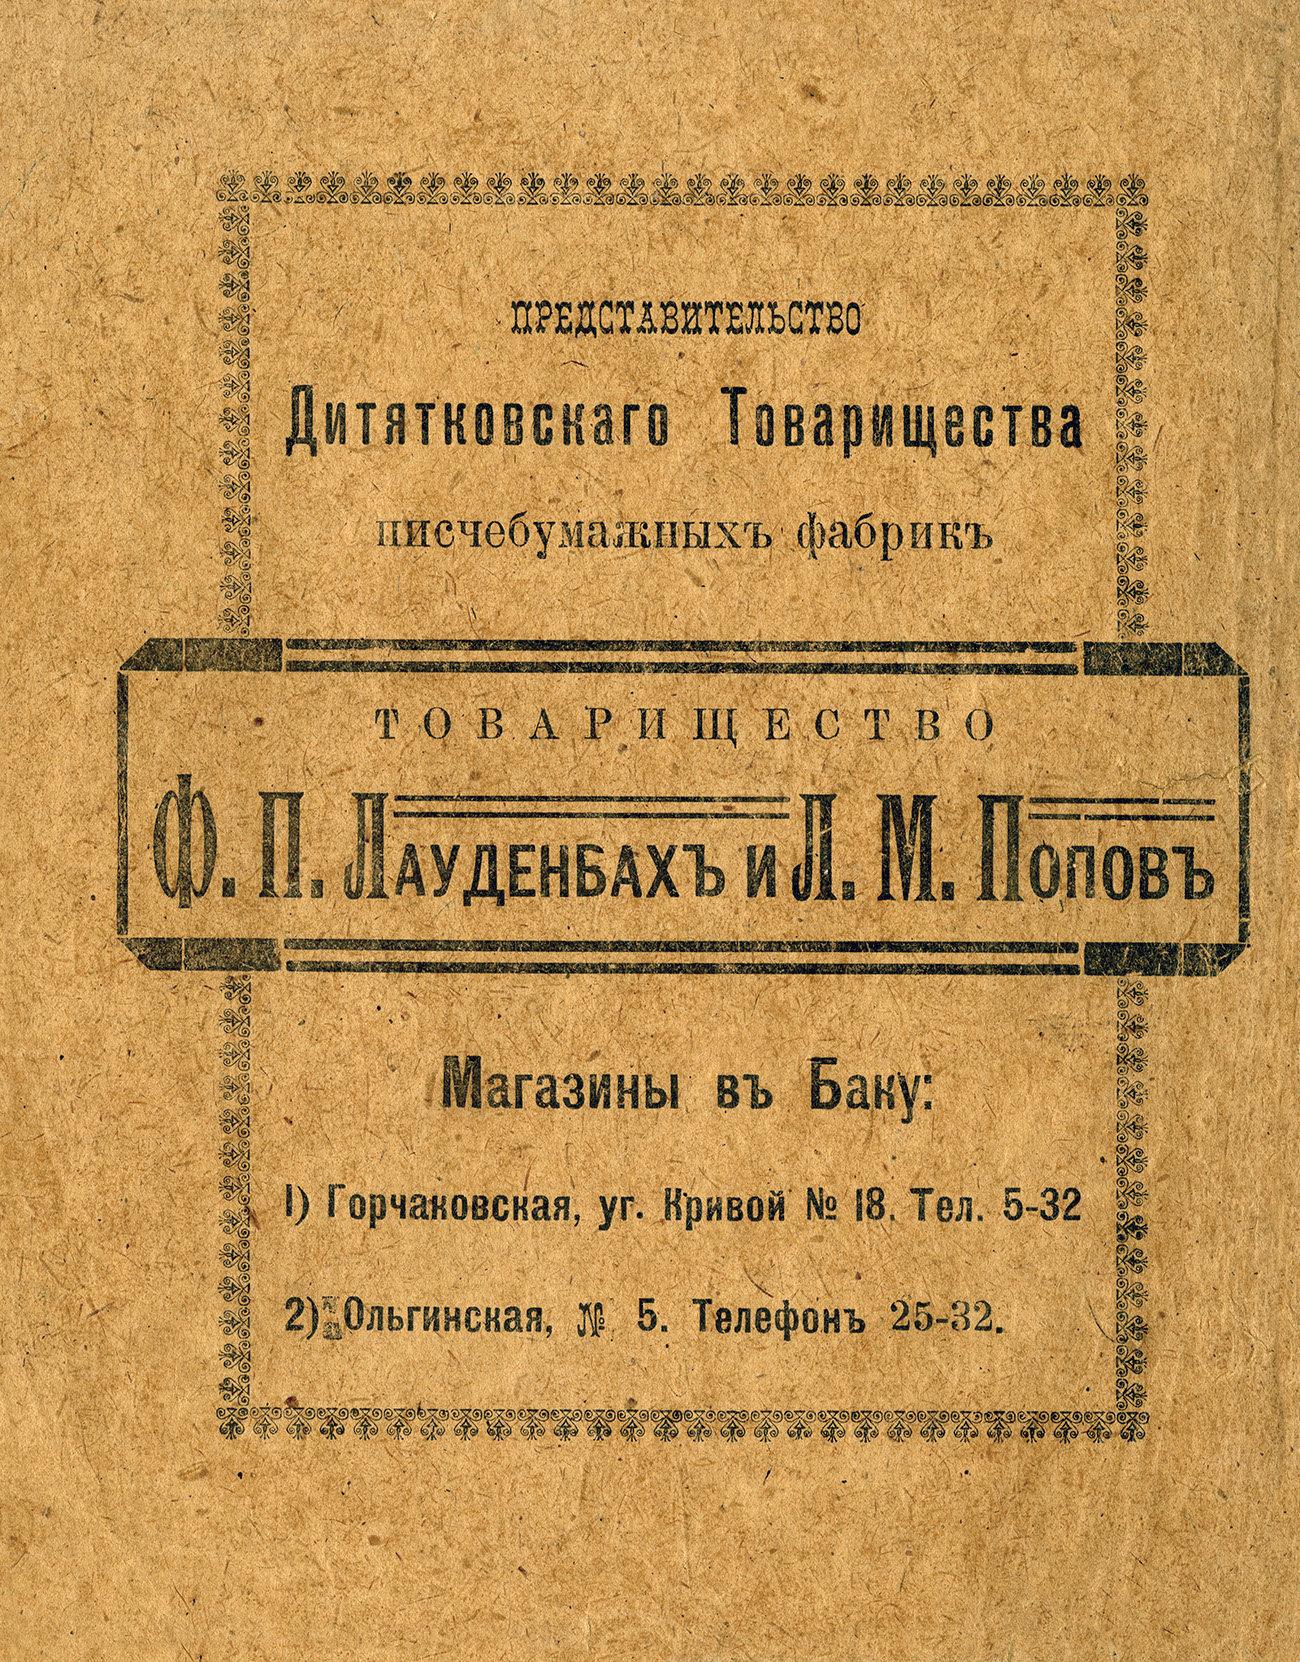 Тетрадь Пушкин, 1919 г., 225х180, оборот